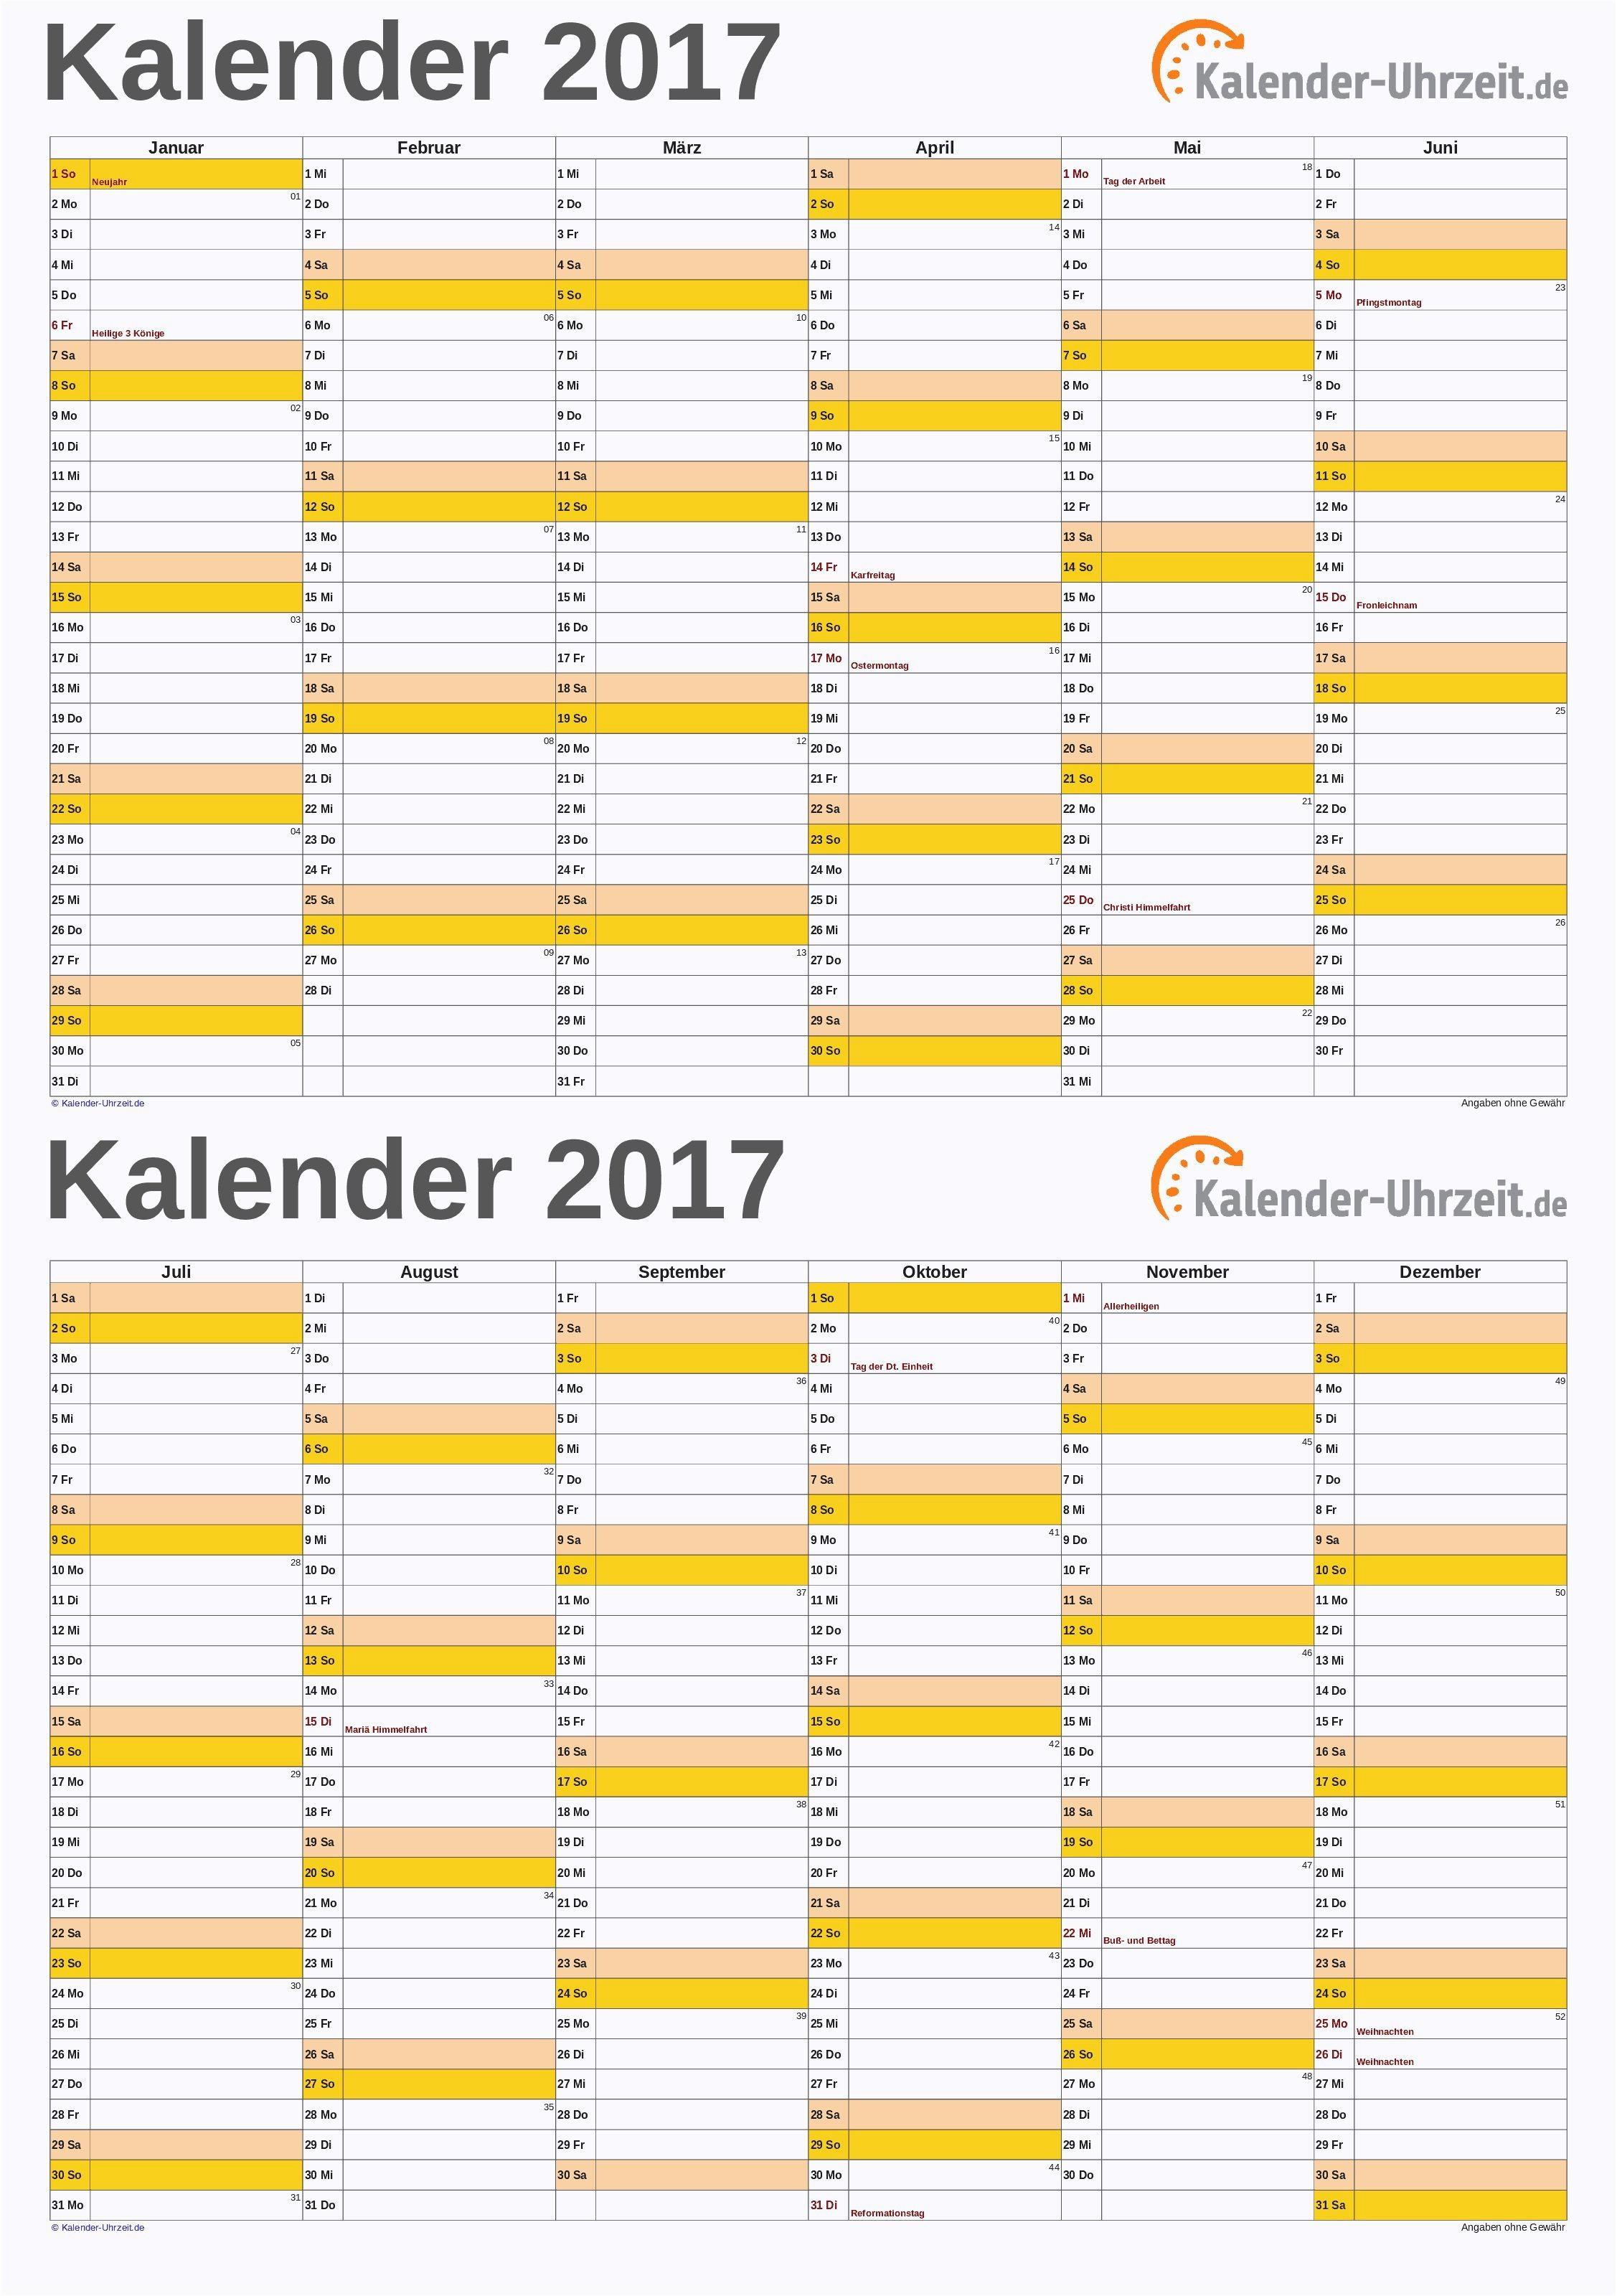 Kalender Tahun 2019 Pdf Recientes 59 Fotografie Von Fotokalender 2017 Zum Ausdrucken Of Kalender Tahun 2019 Pdf Más Recientes Awesome 42 Illustration islamic Calendar 2018 Uk Kalendar islam 2018